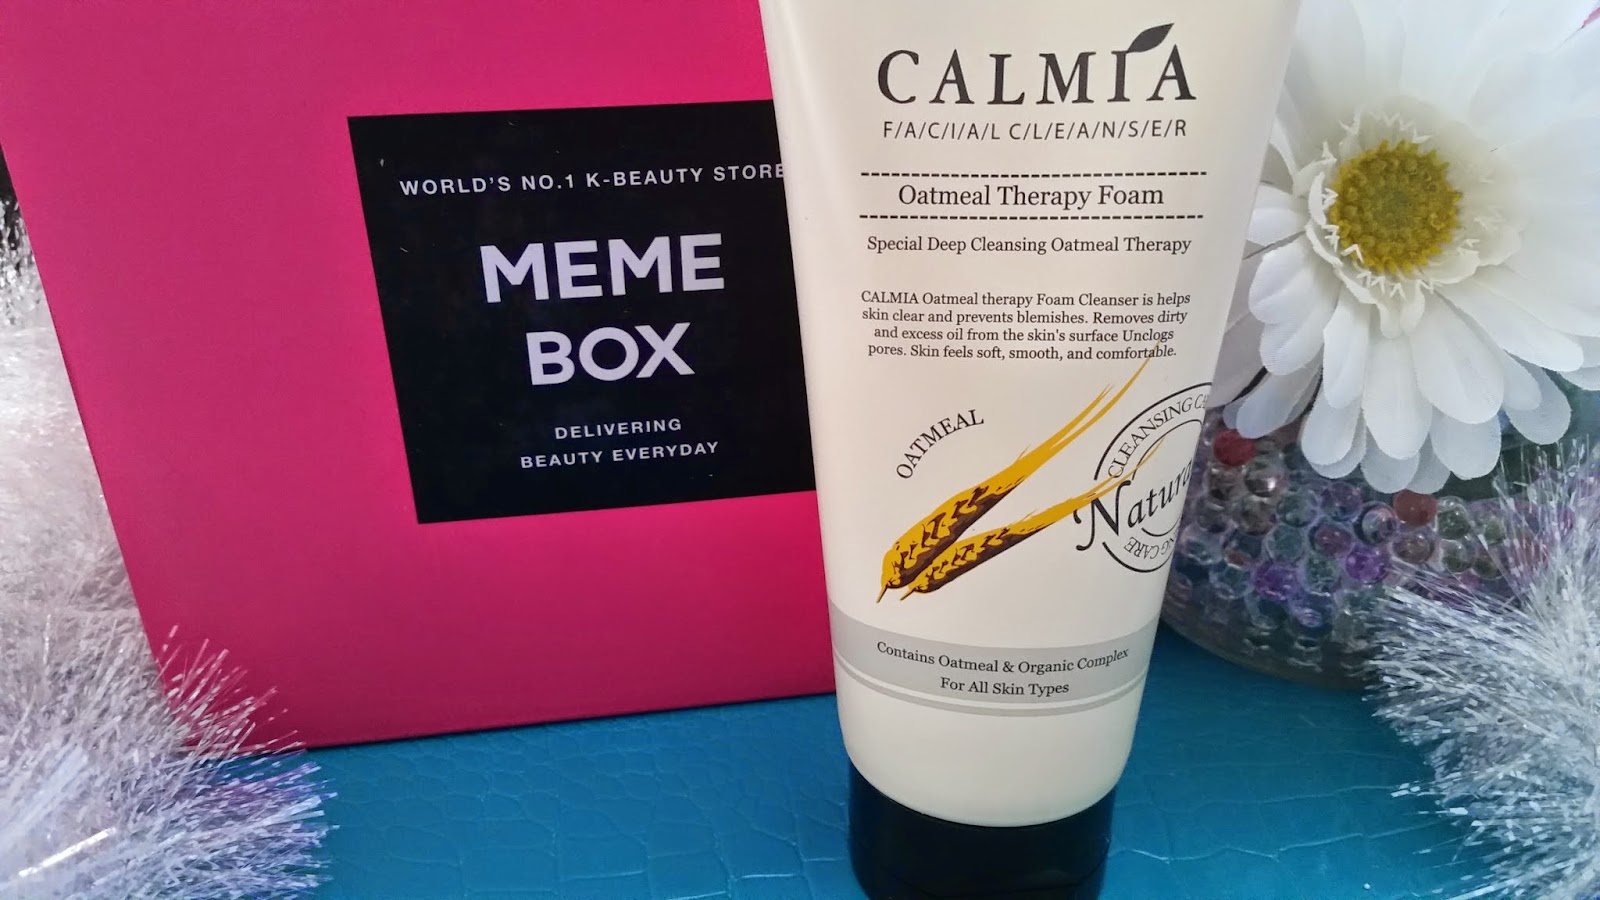 Calmia Facial Cleanser Oatmeal Therapy Foam